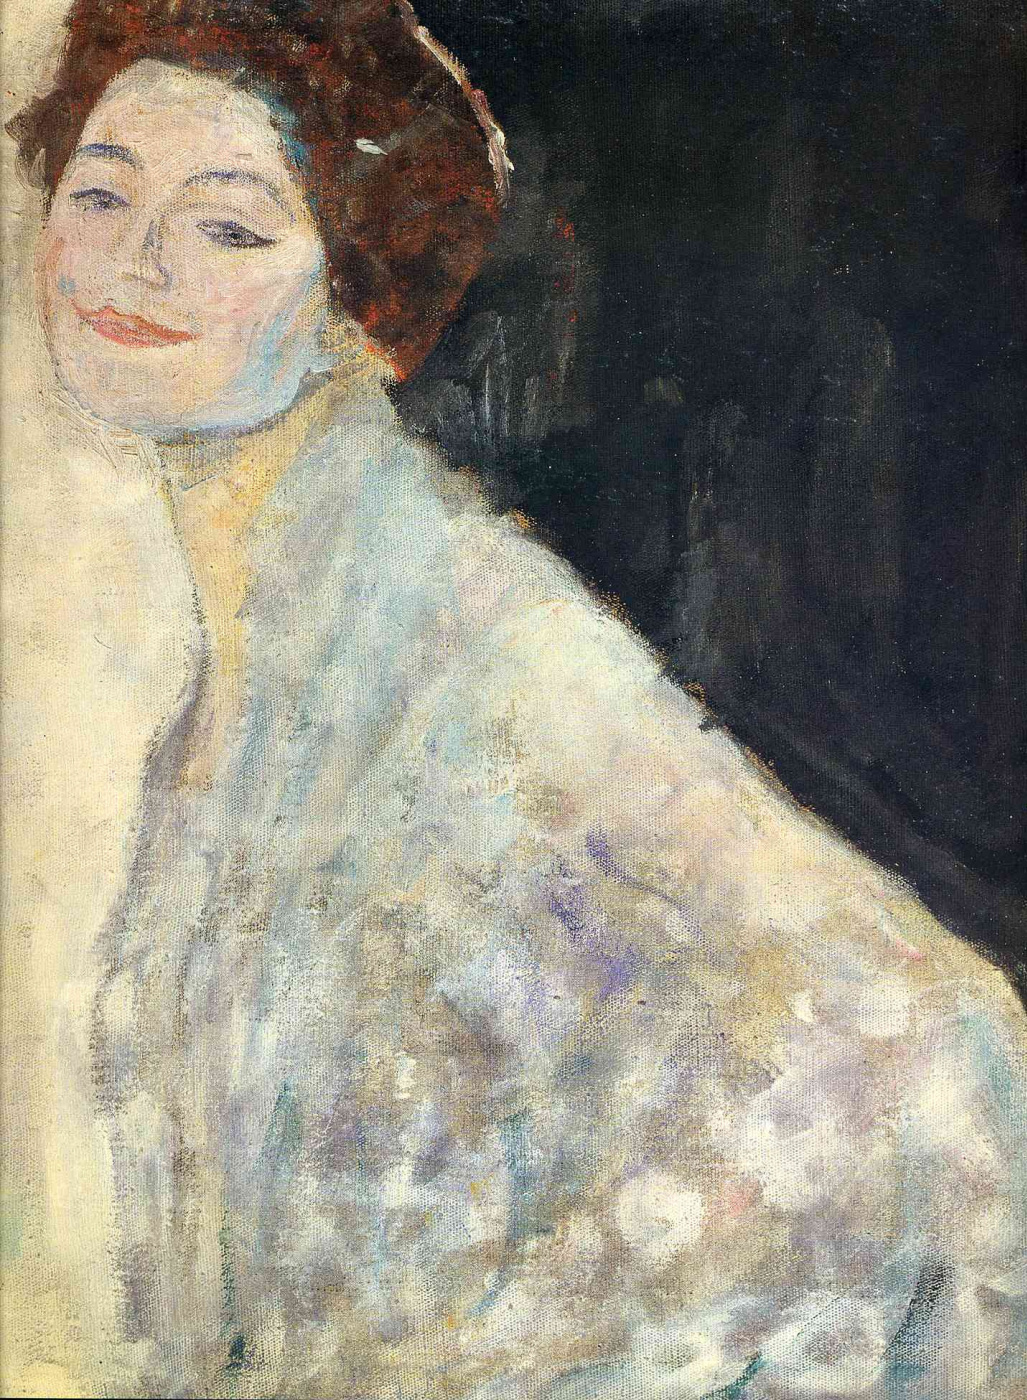 Gustav Klimt. The portrait of a lady in white